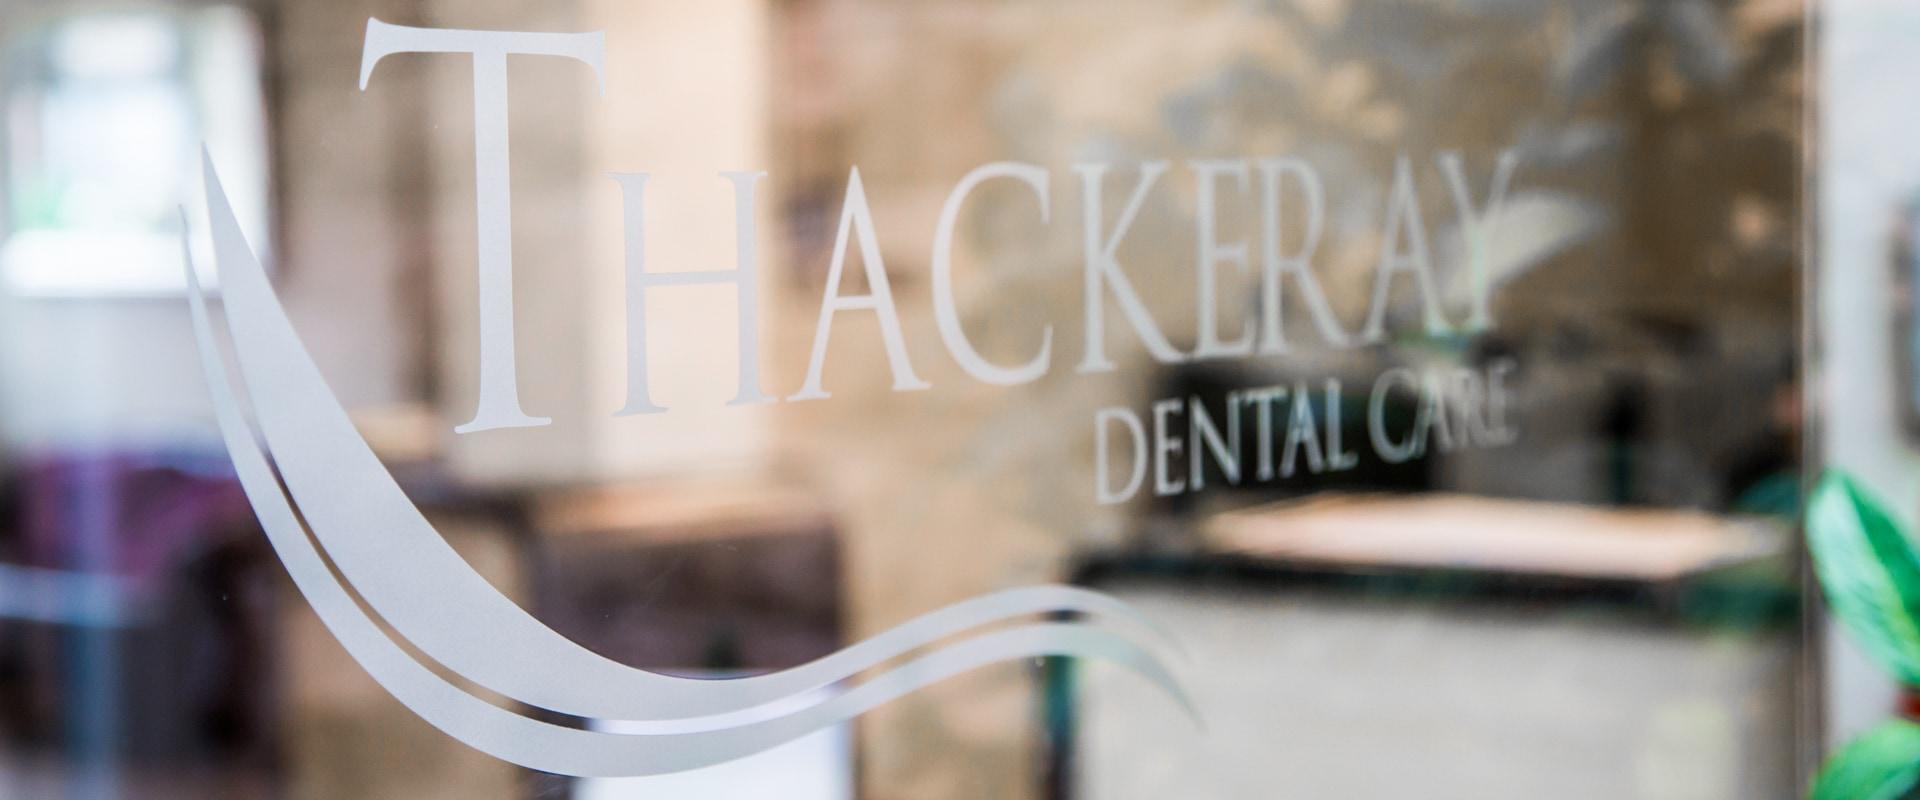 thackeray dentist team